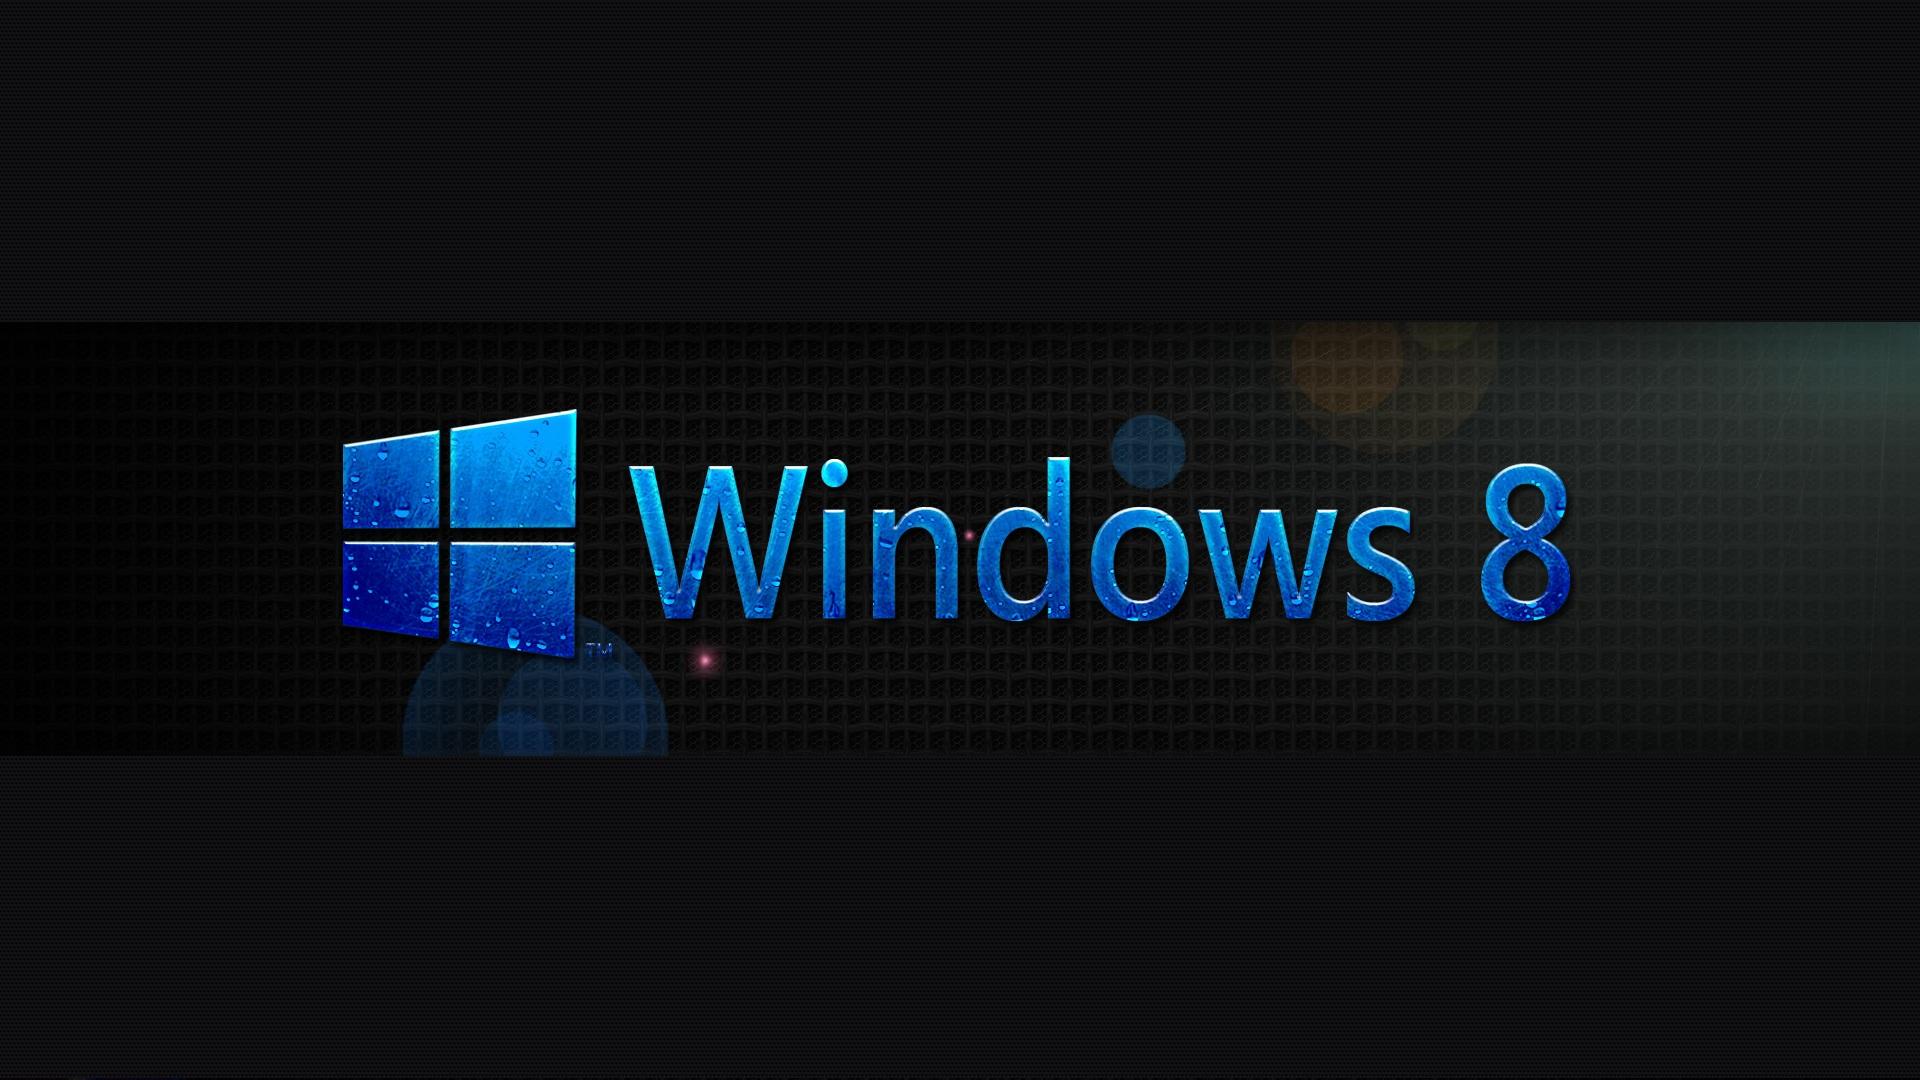 Windows Windows 8 Black Windows Black Black Hd Black Wallpaper 1920x1080